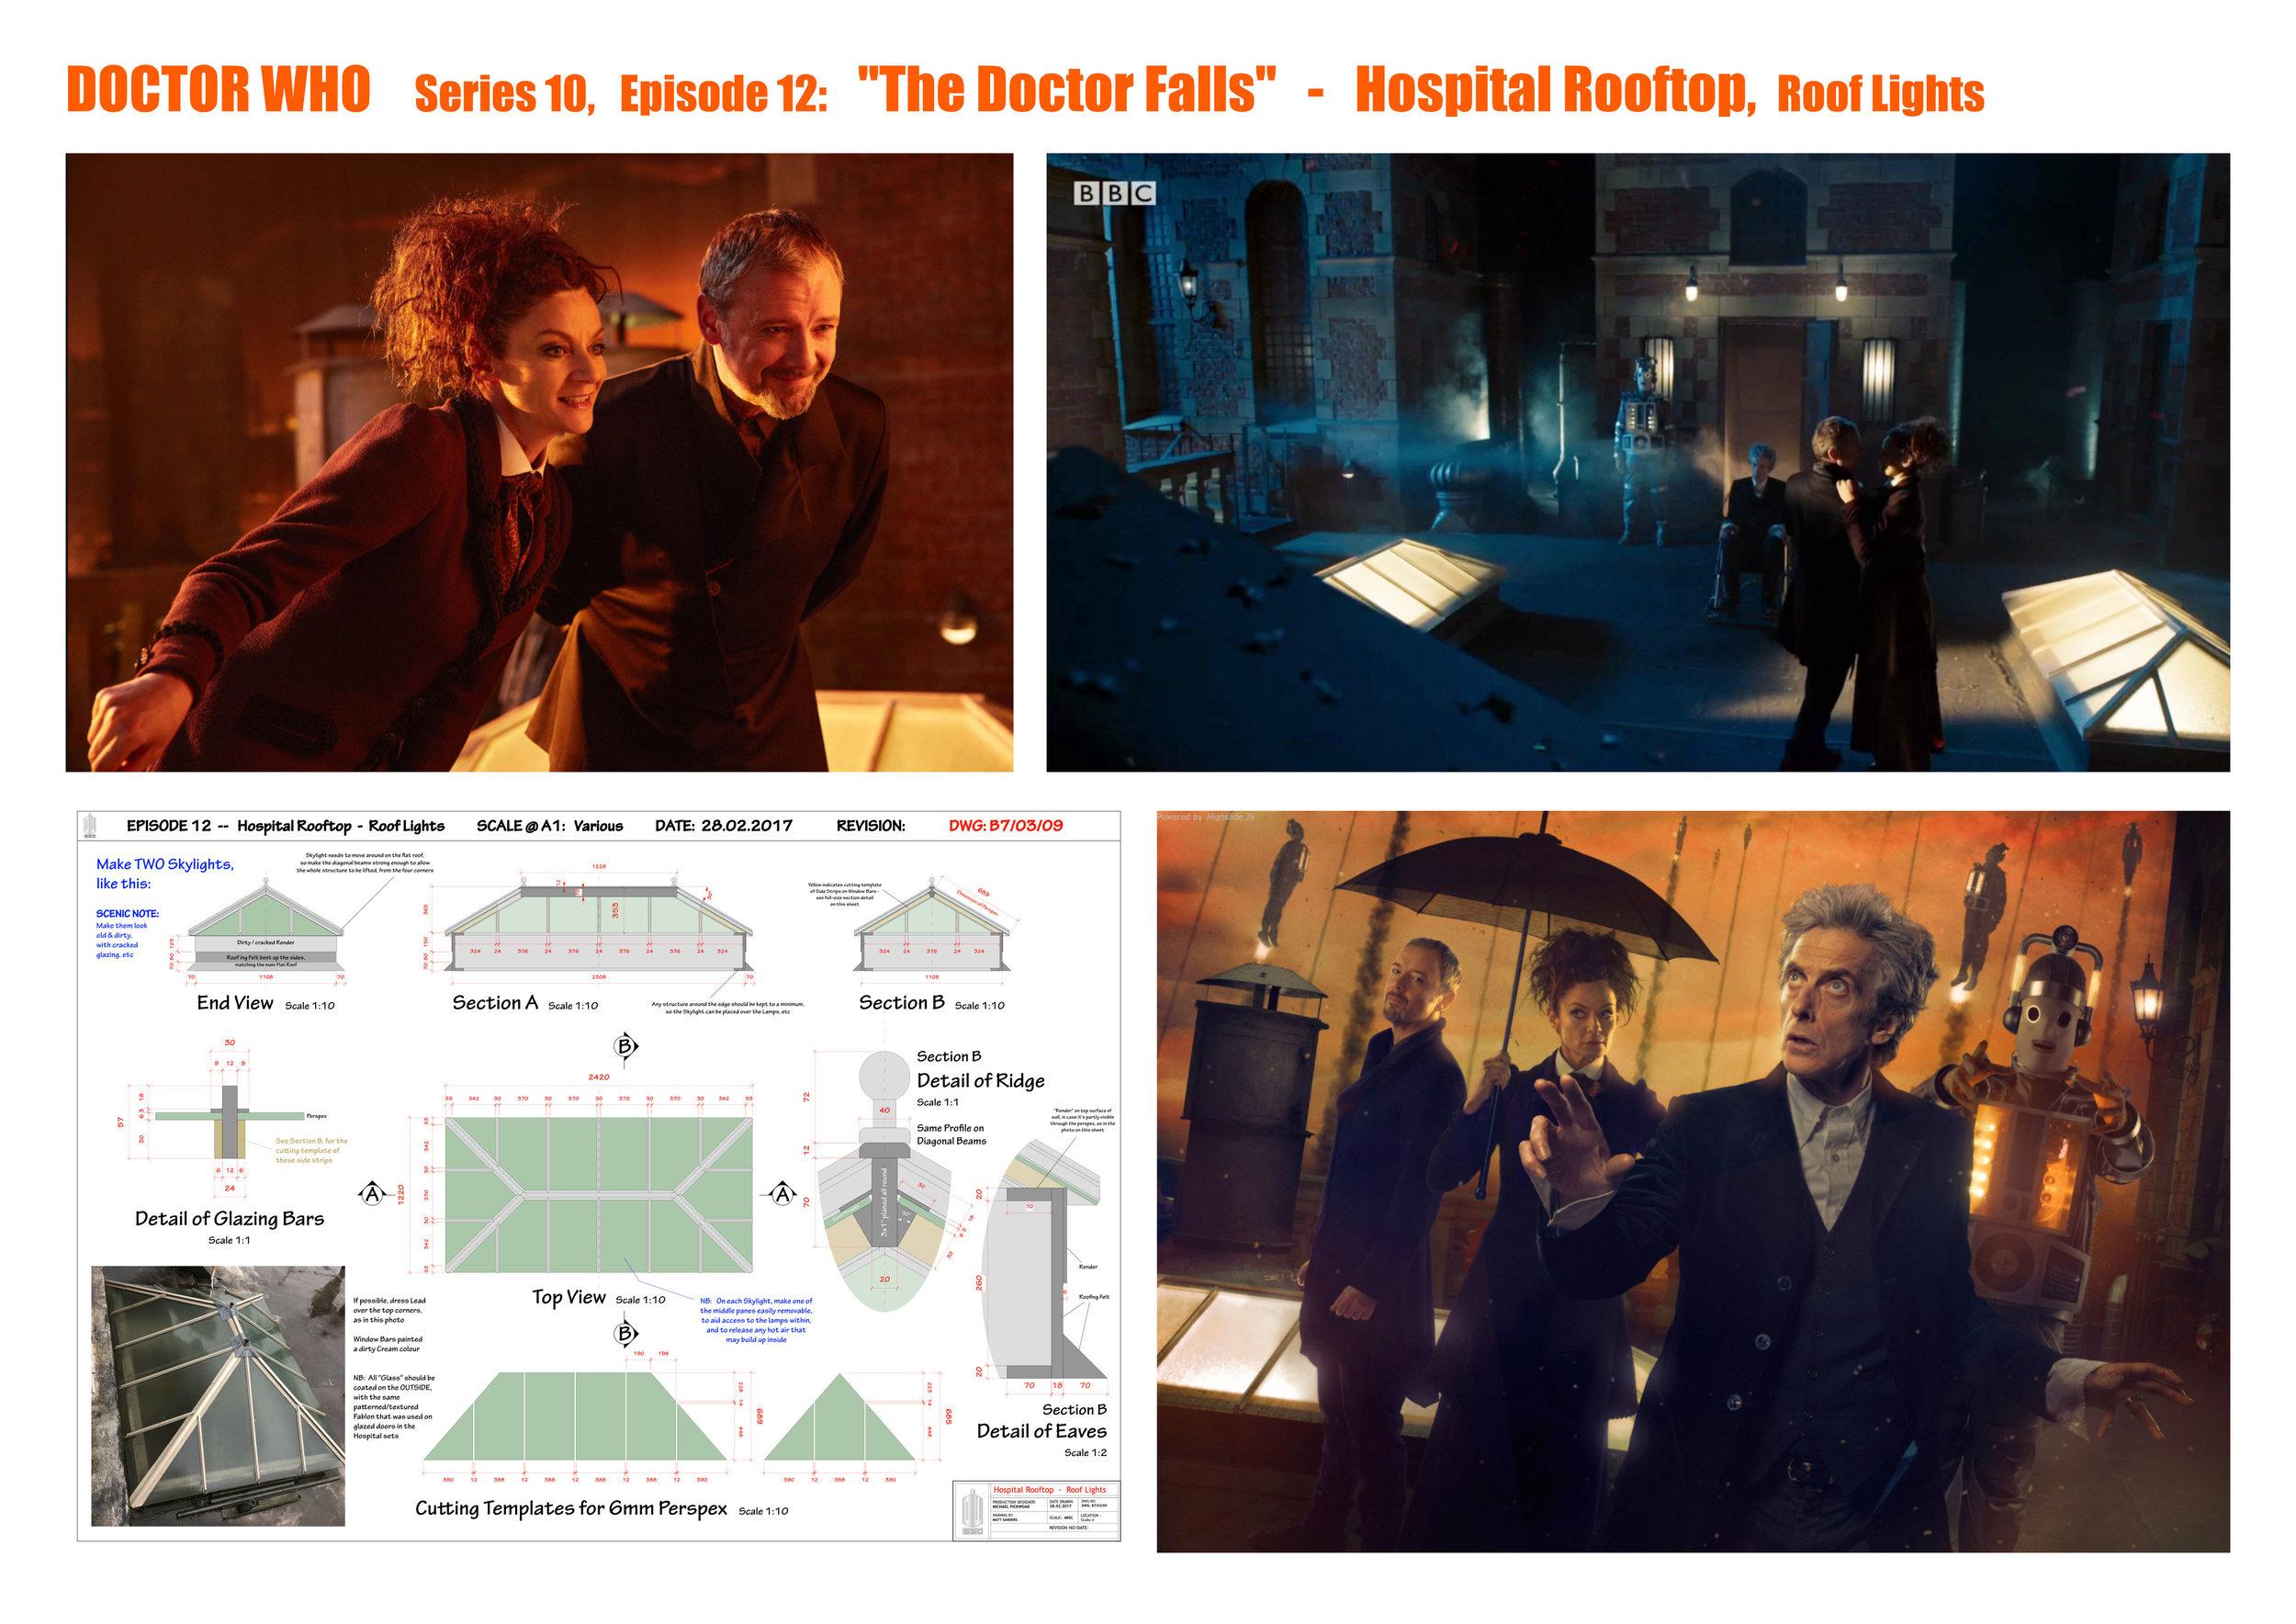 Ep 12 - The Doctor Falls - Hospital Roof Lights.jpg